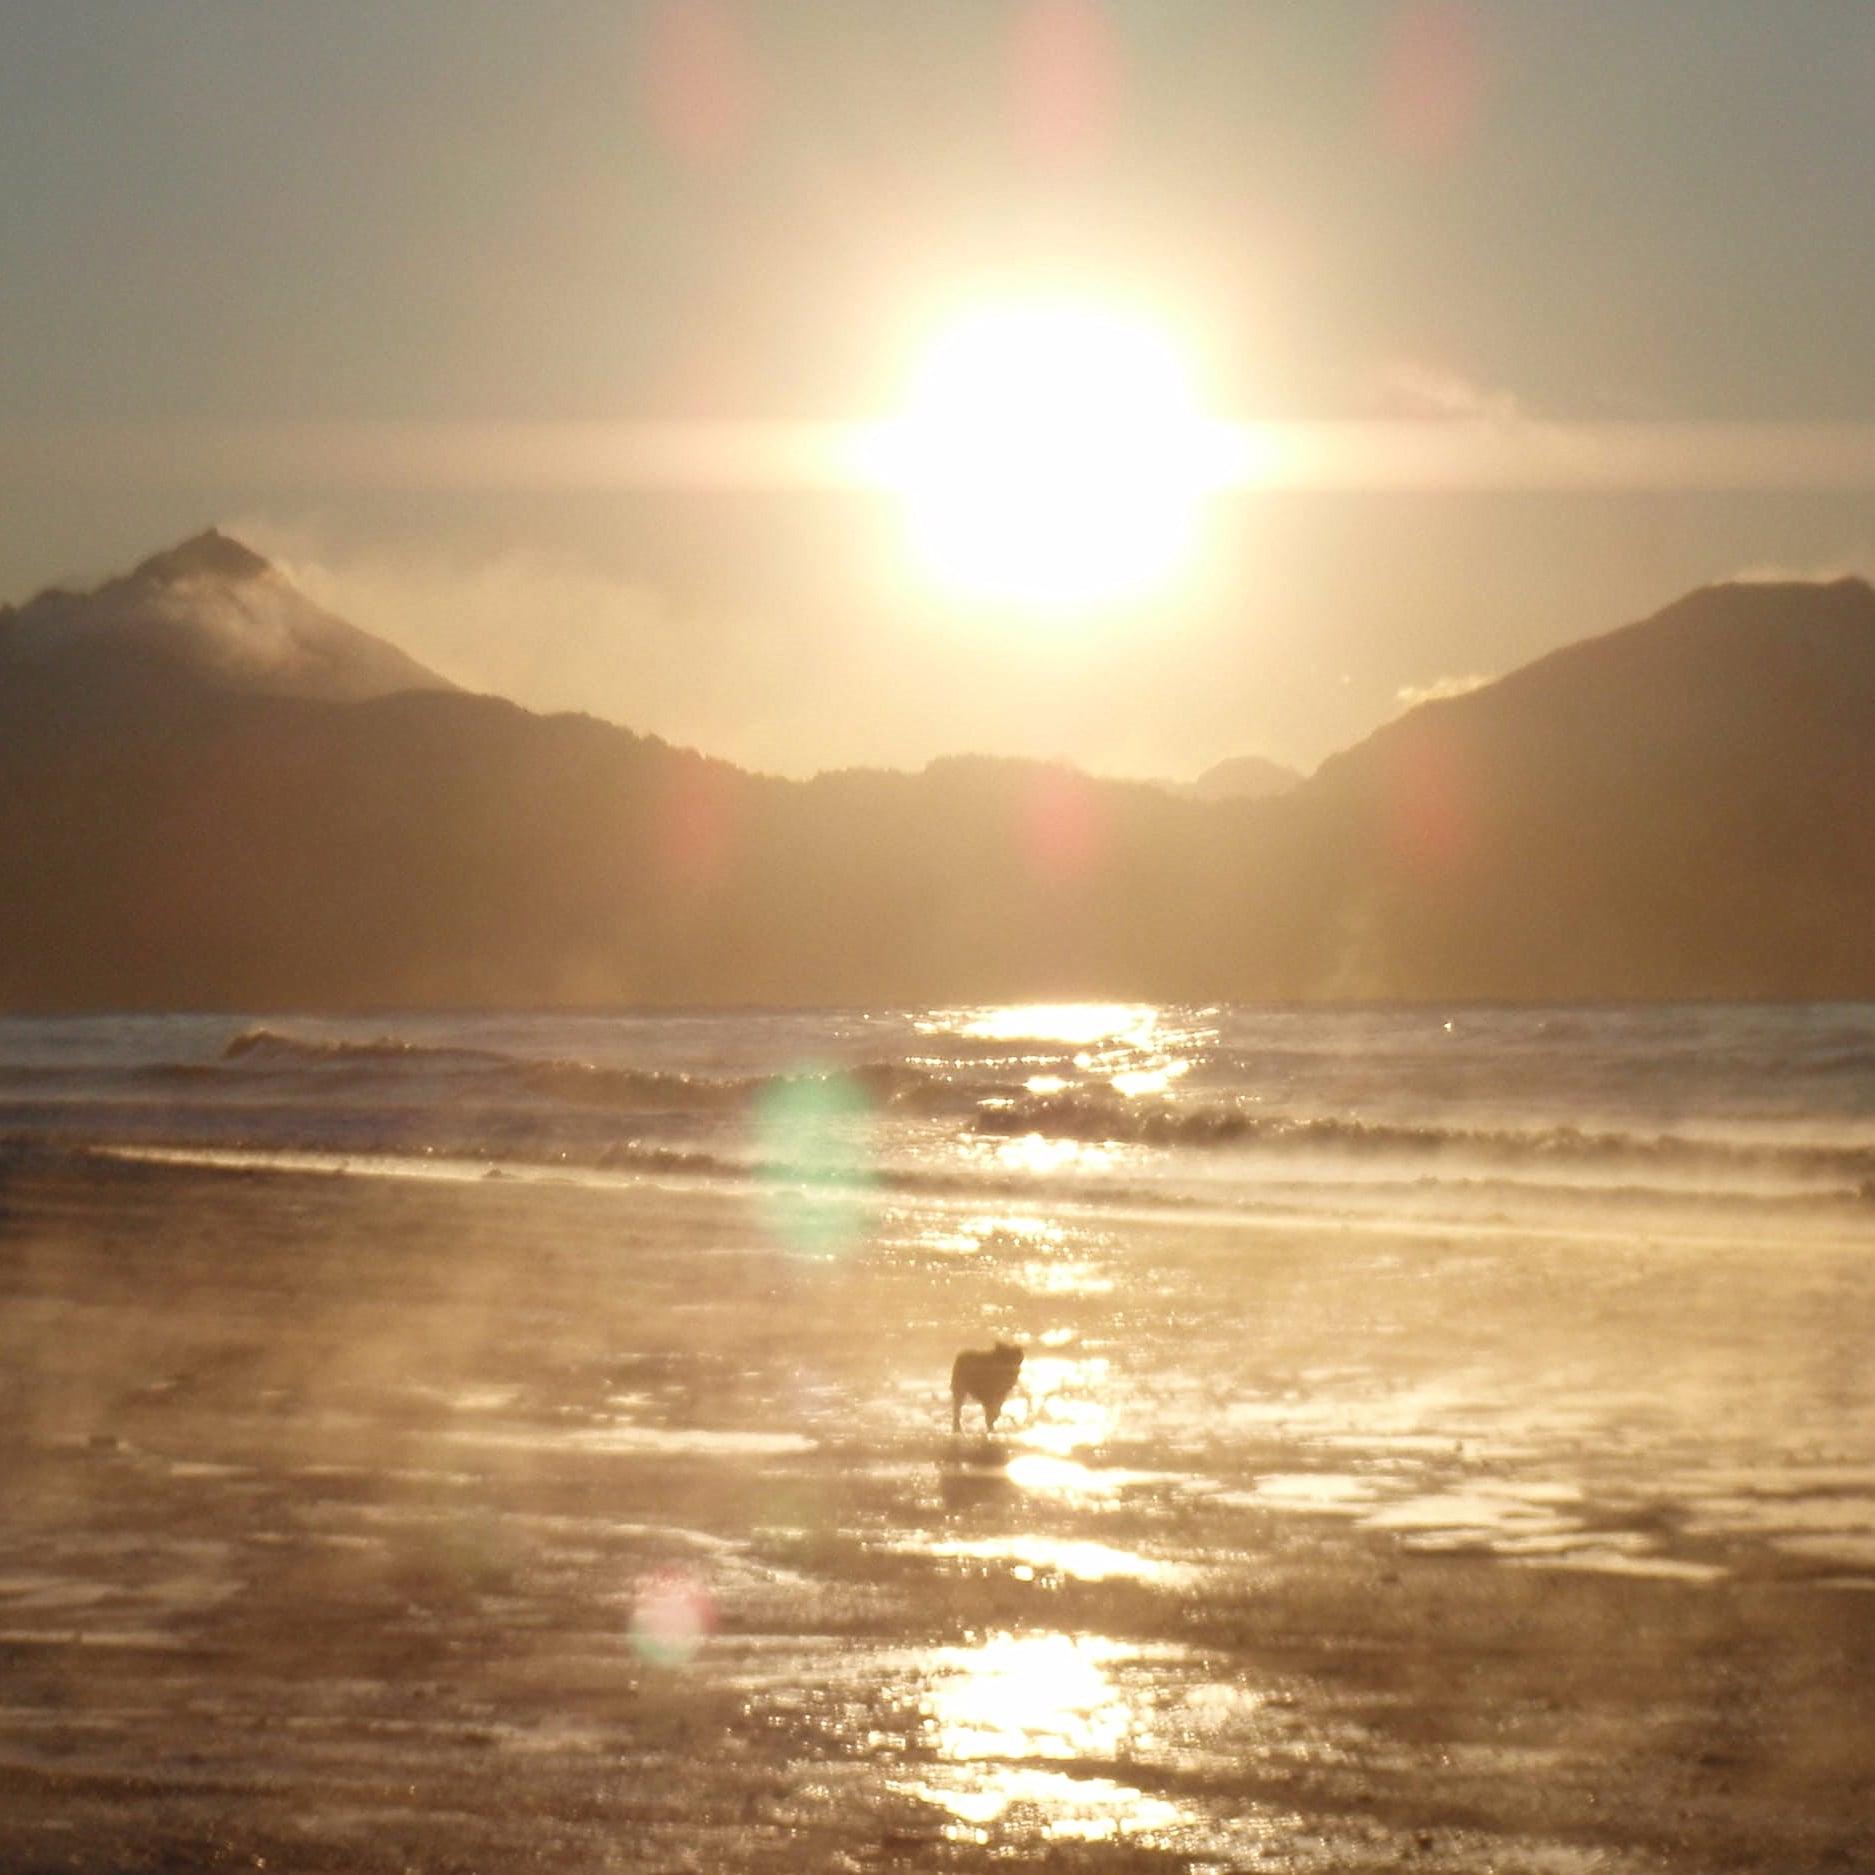 Dog at the beach during sunrise in Homer Alaska